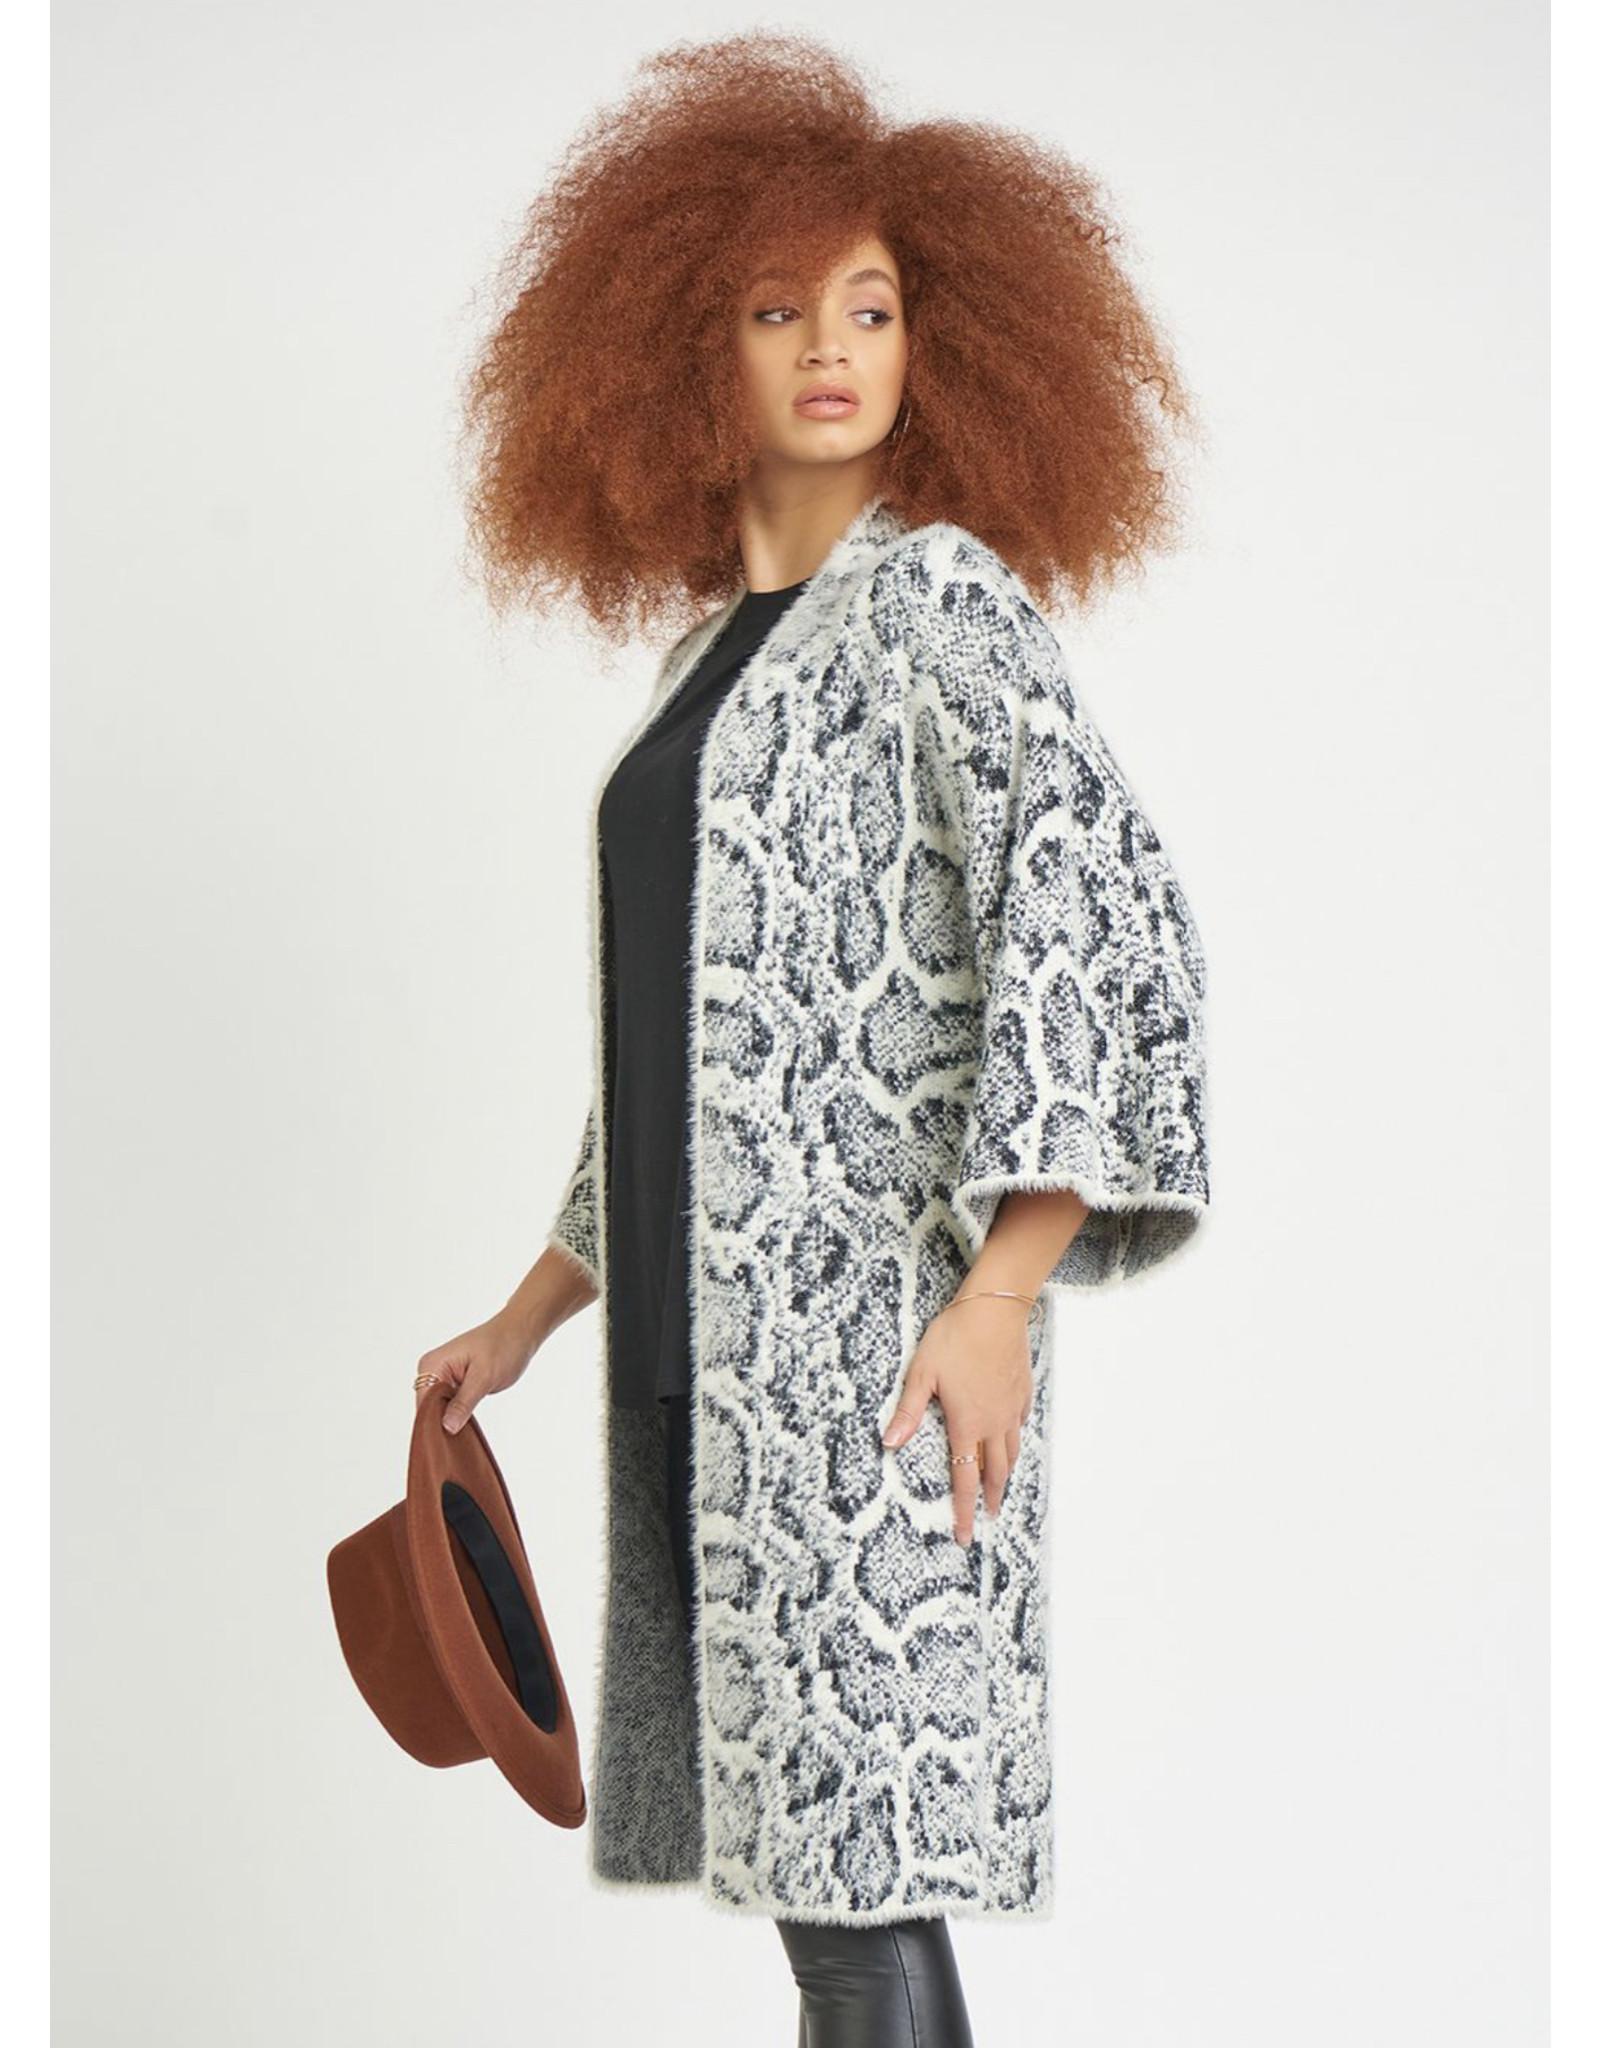 Kimono Sleeve Snake Print Cardigan Sweater, Black/White